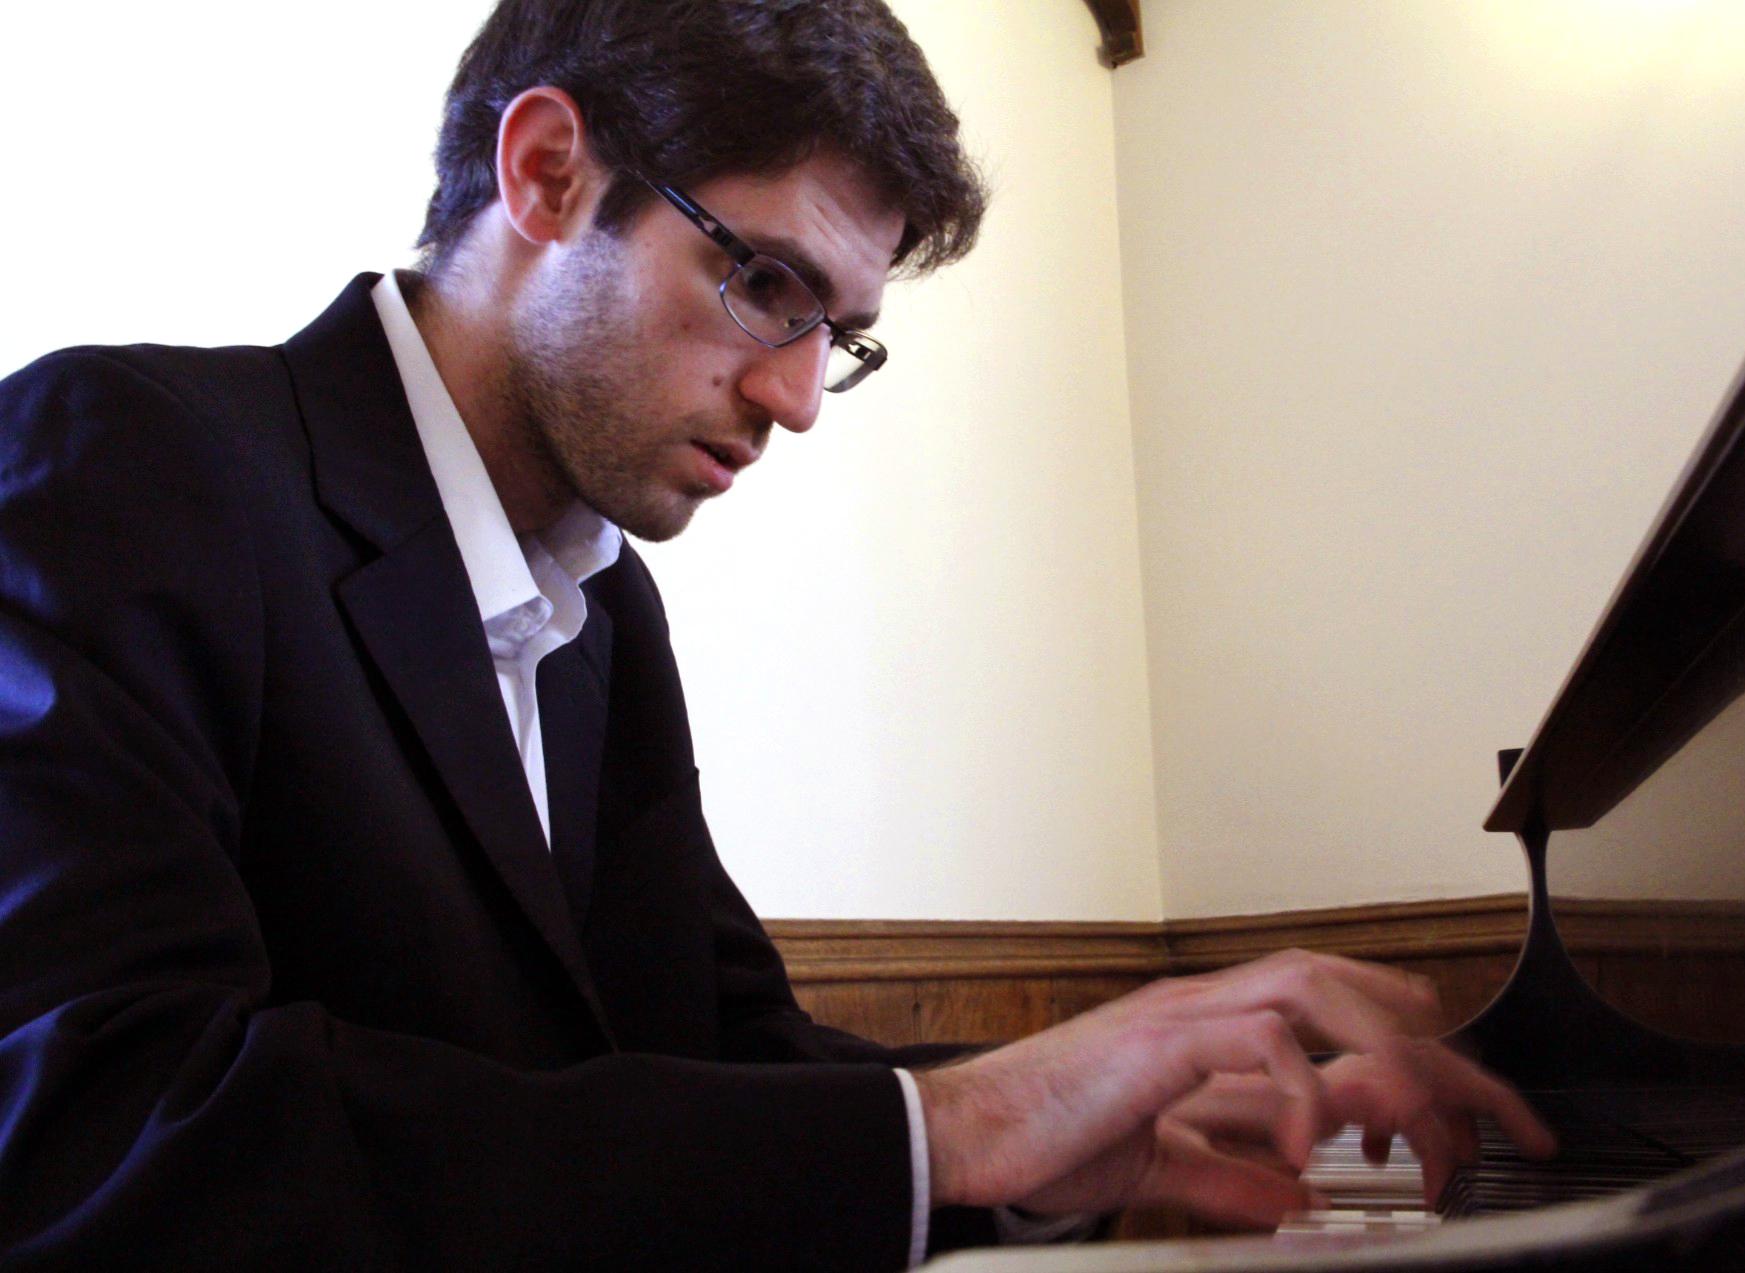 The Arts Arena Yale School of Music Recital, Yevgeny Yontov, piano